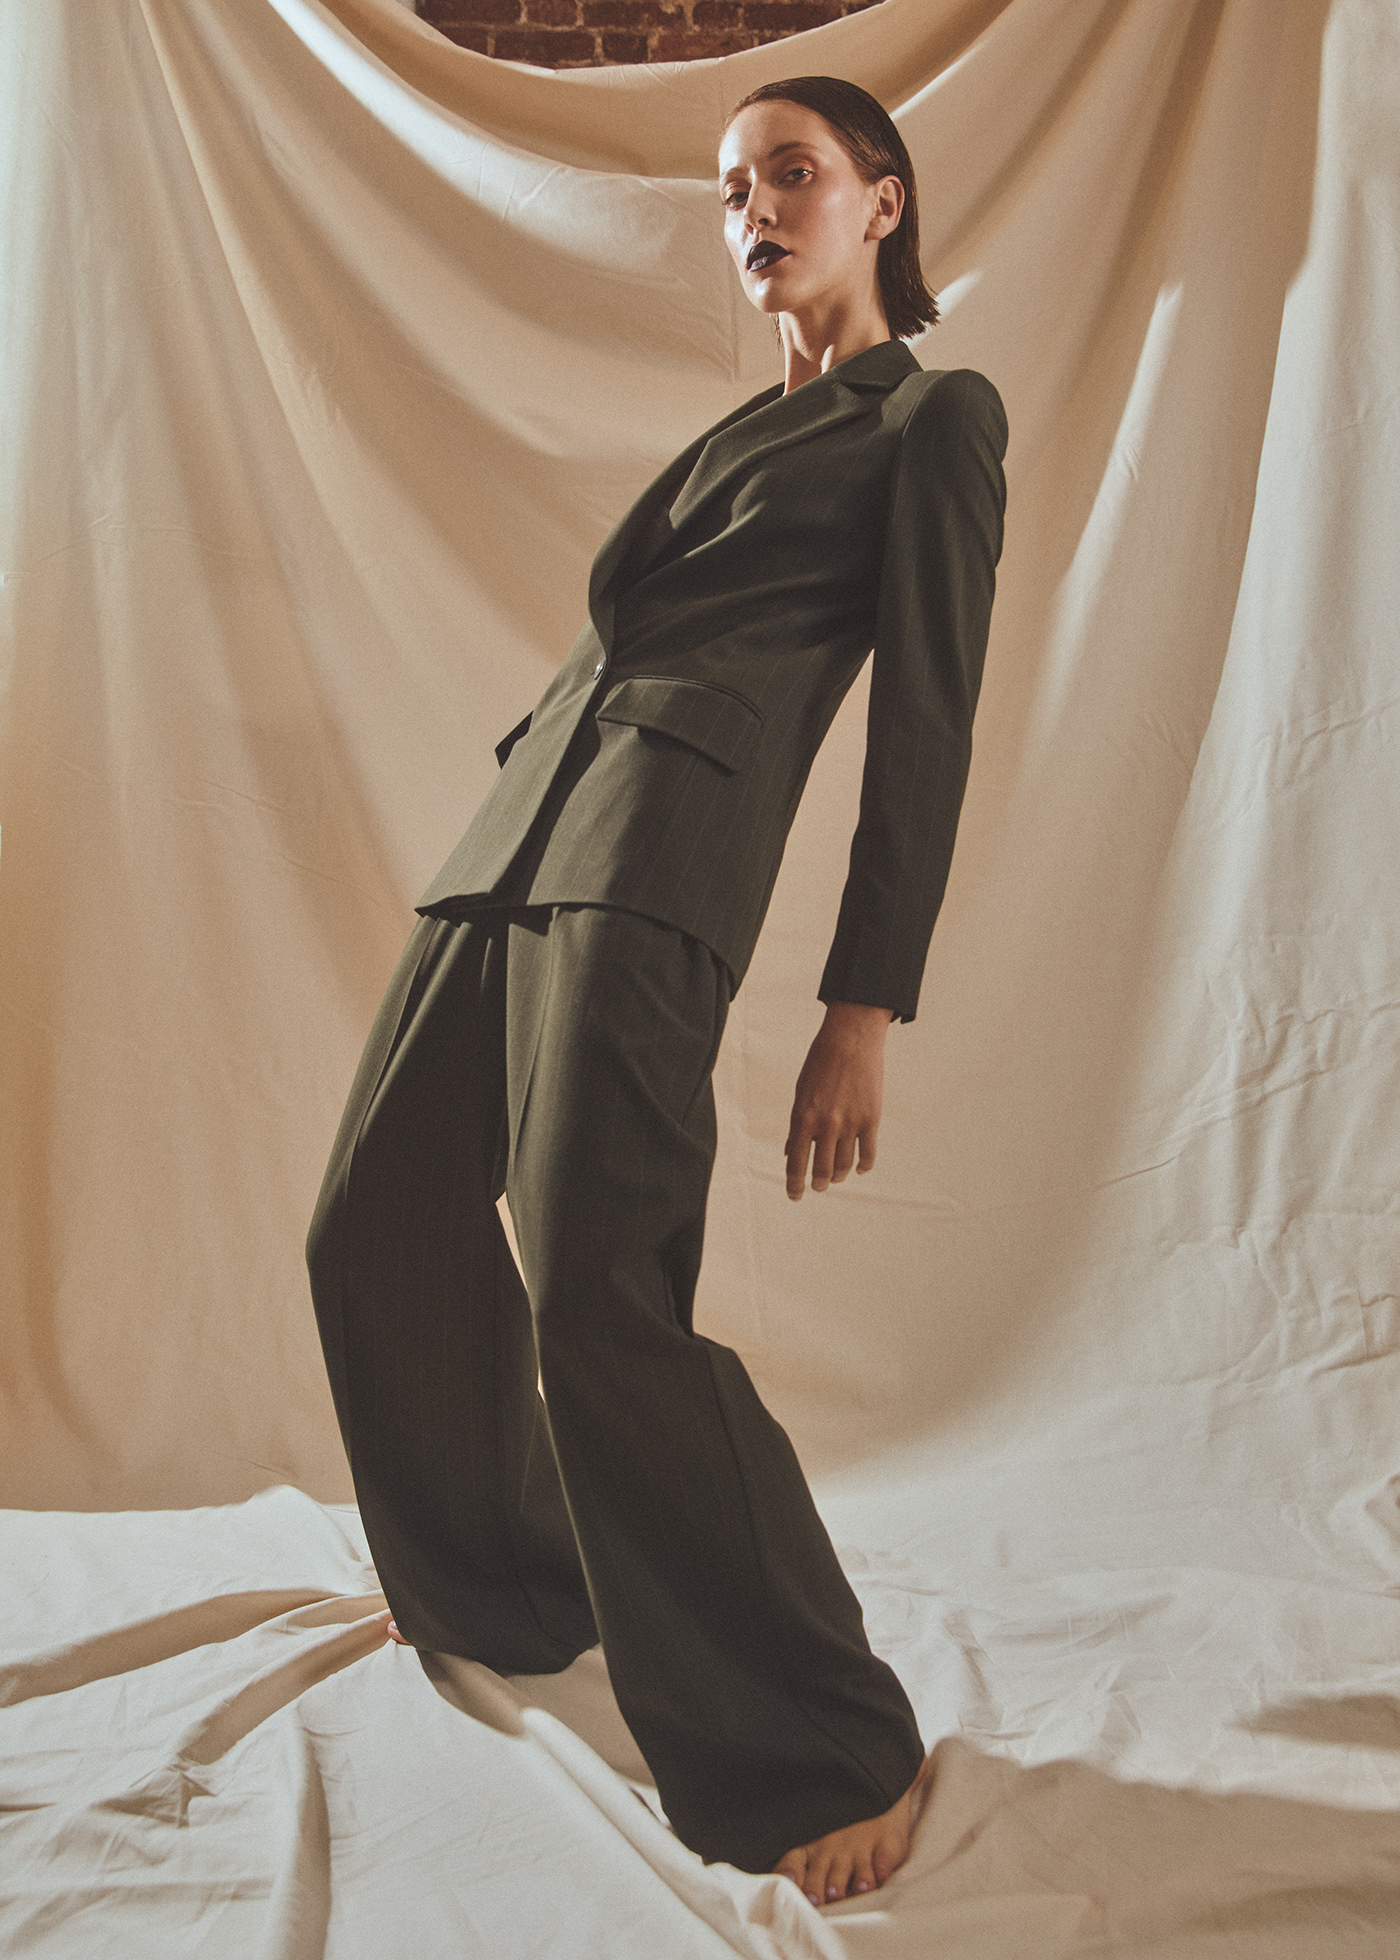 Fashion  fashion editorial